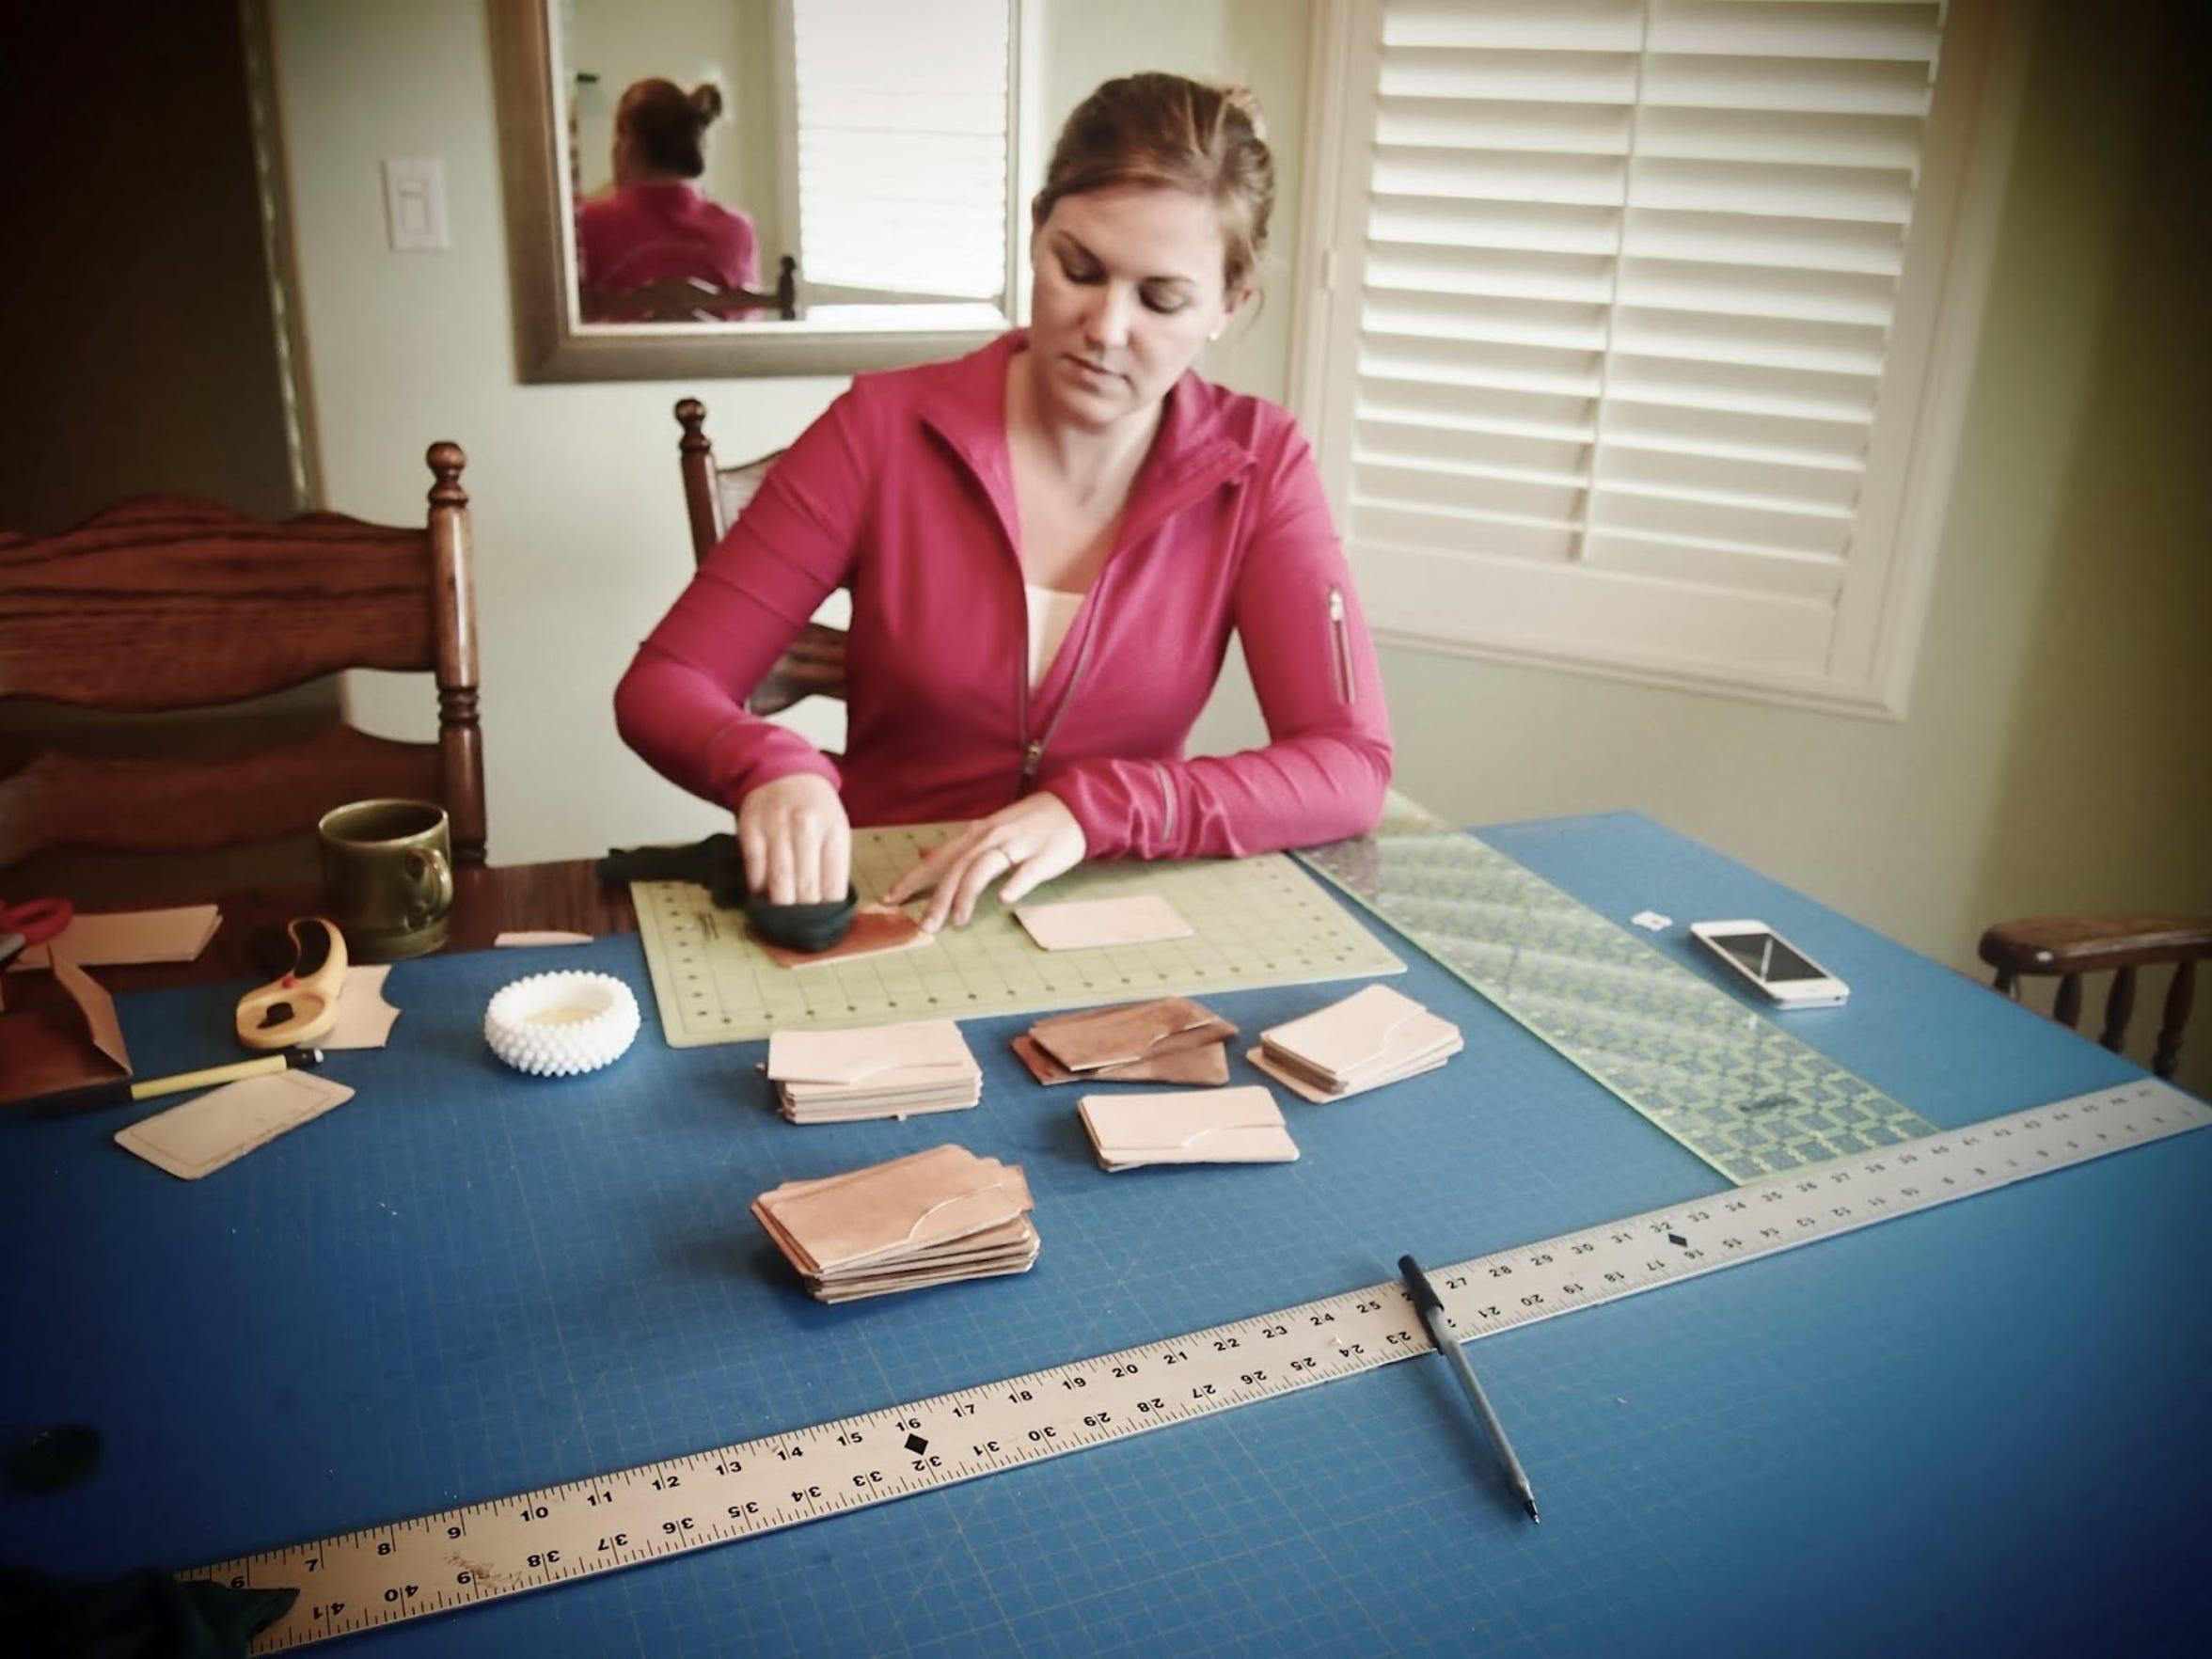 Amber Kanallakan of Visalia works on homemade leather